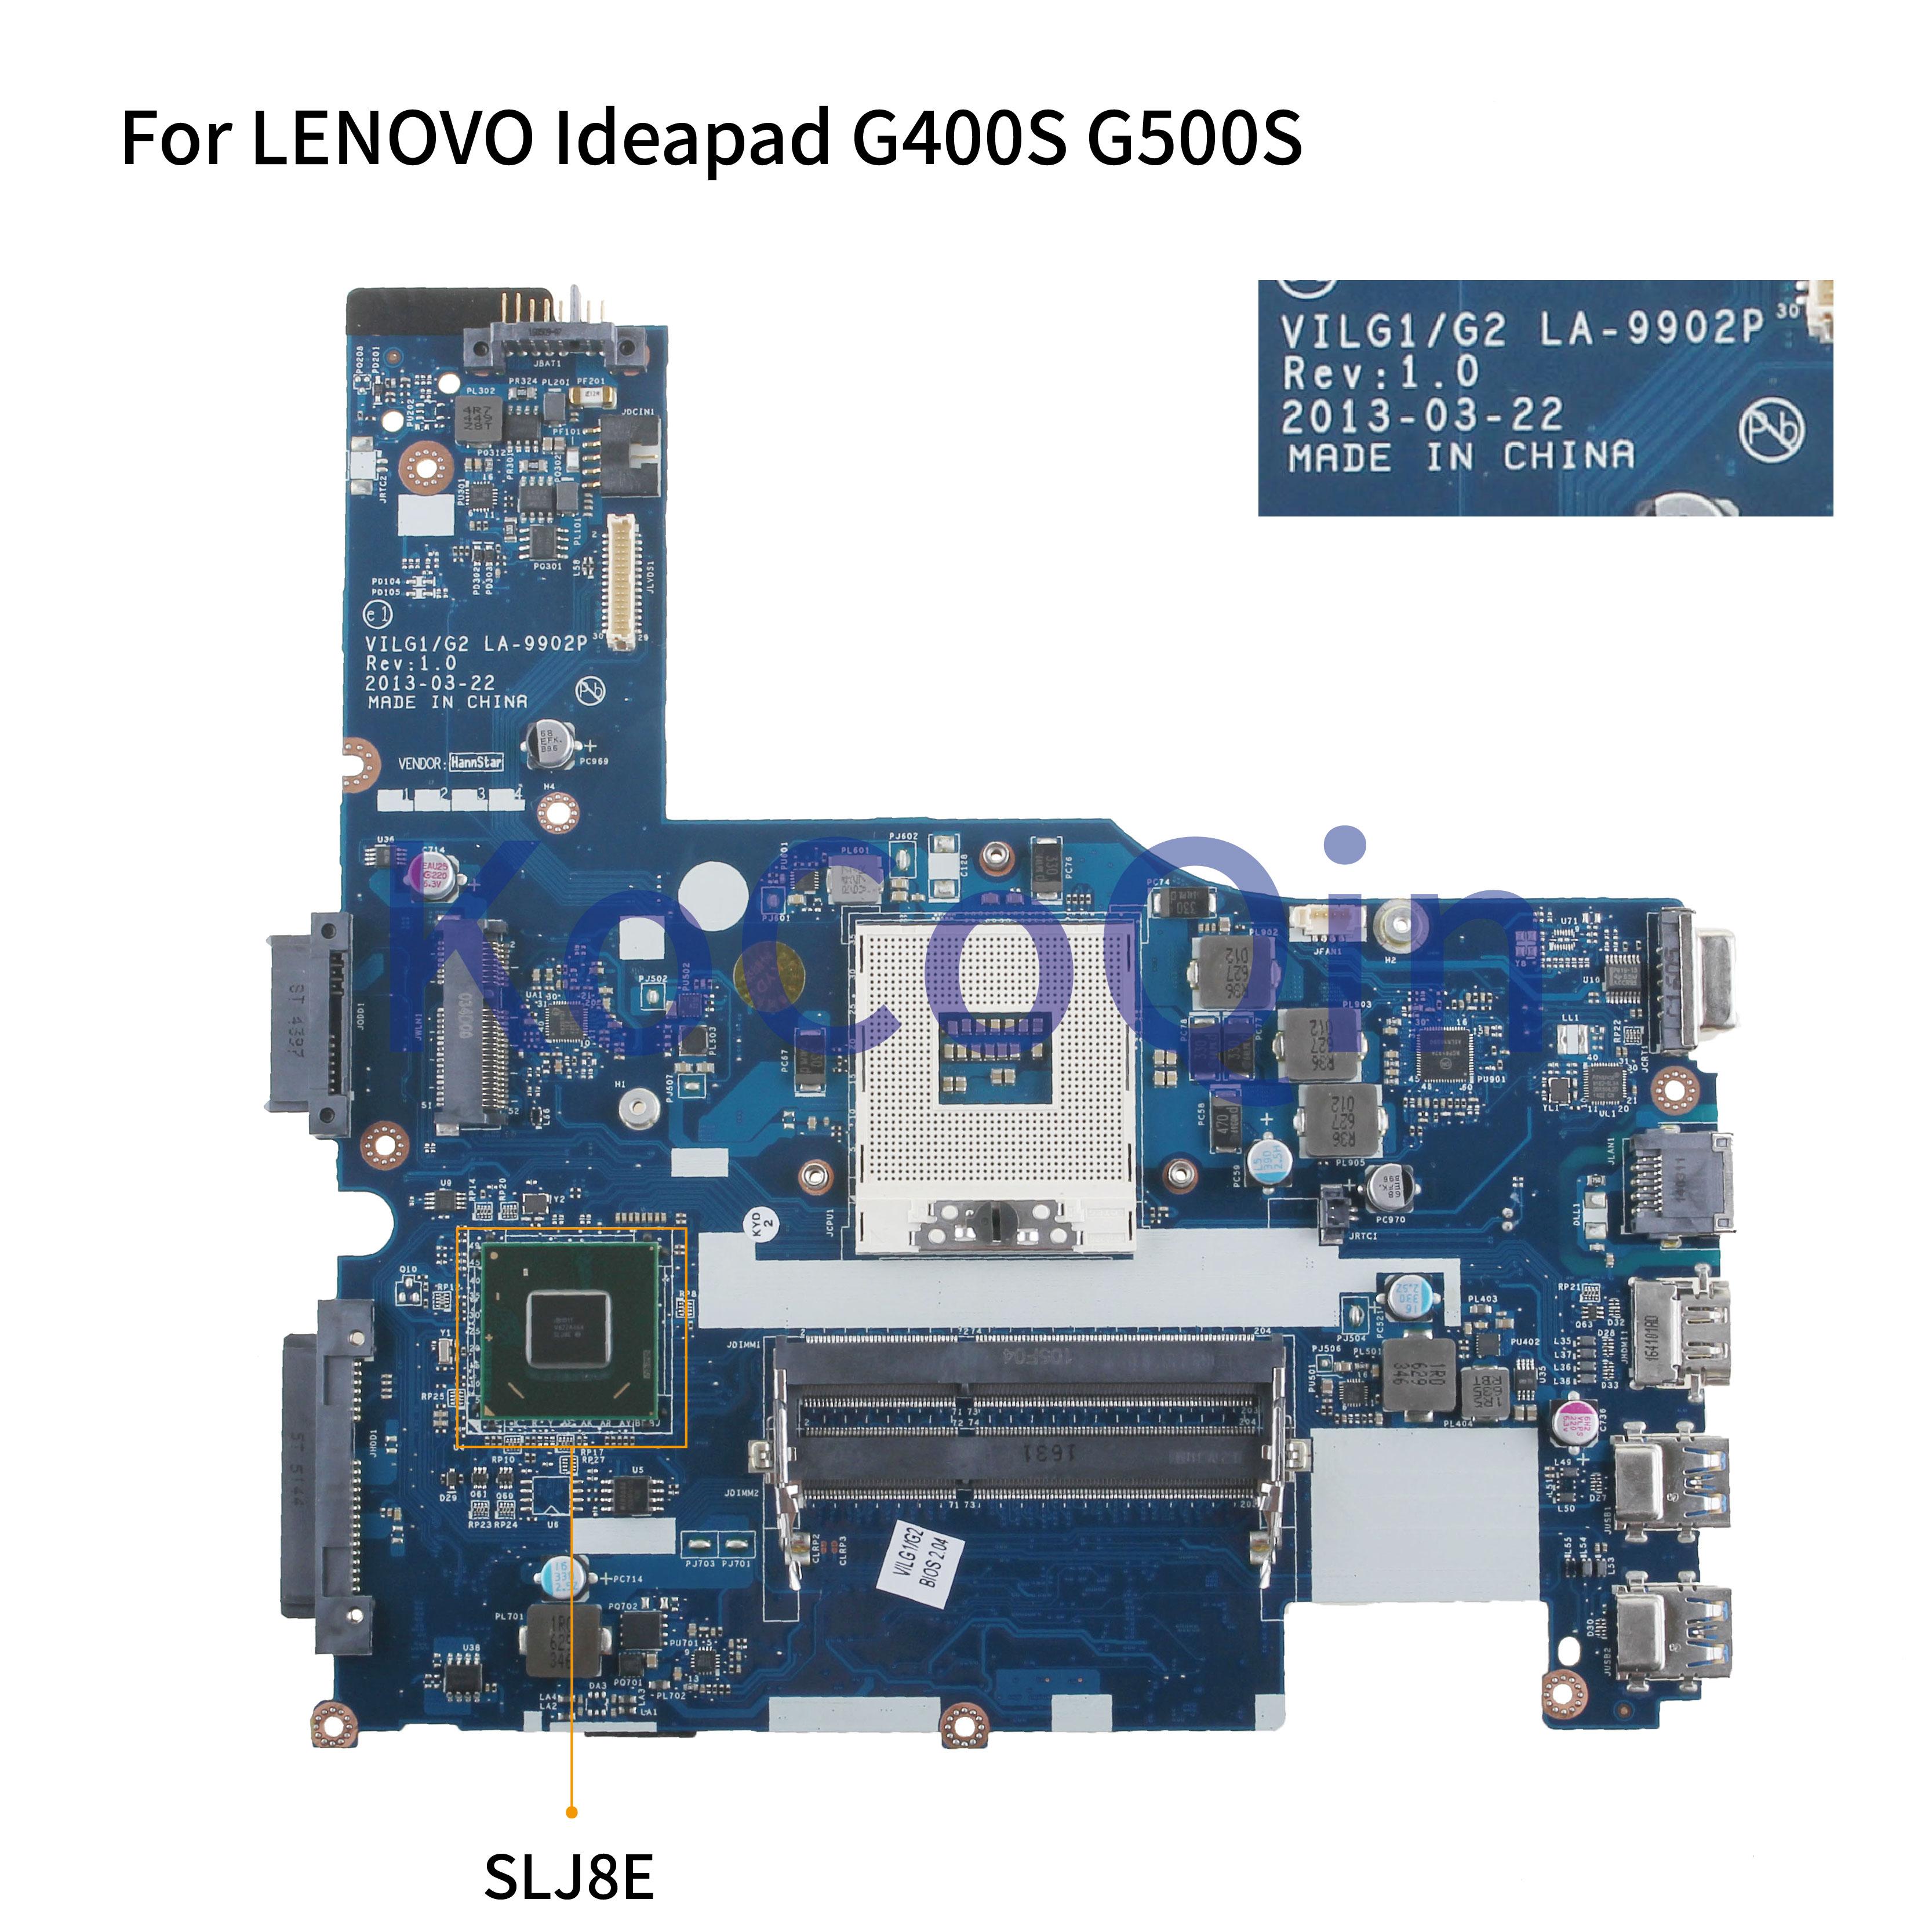 KoCoQin Laptop Motherboard For LENOVO Ideapad G400S 14.1' Inch HM76 Mainboard VILGL1/G2 LA-9902P SLJ8E